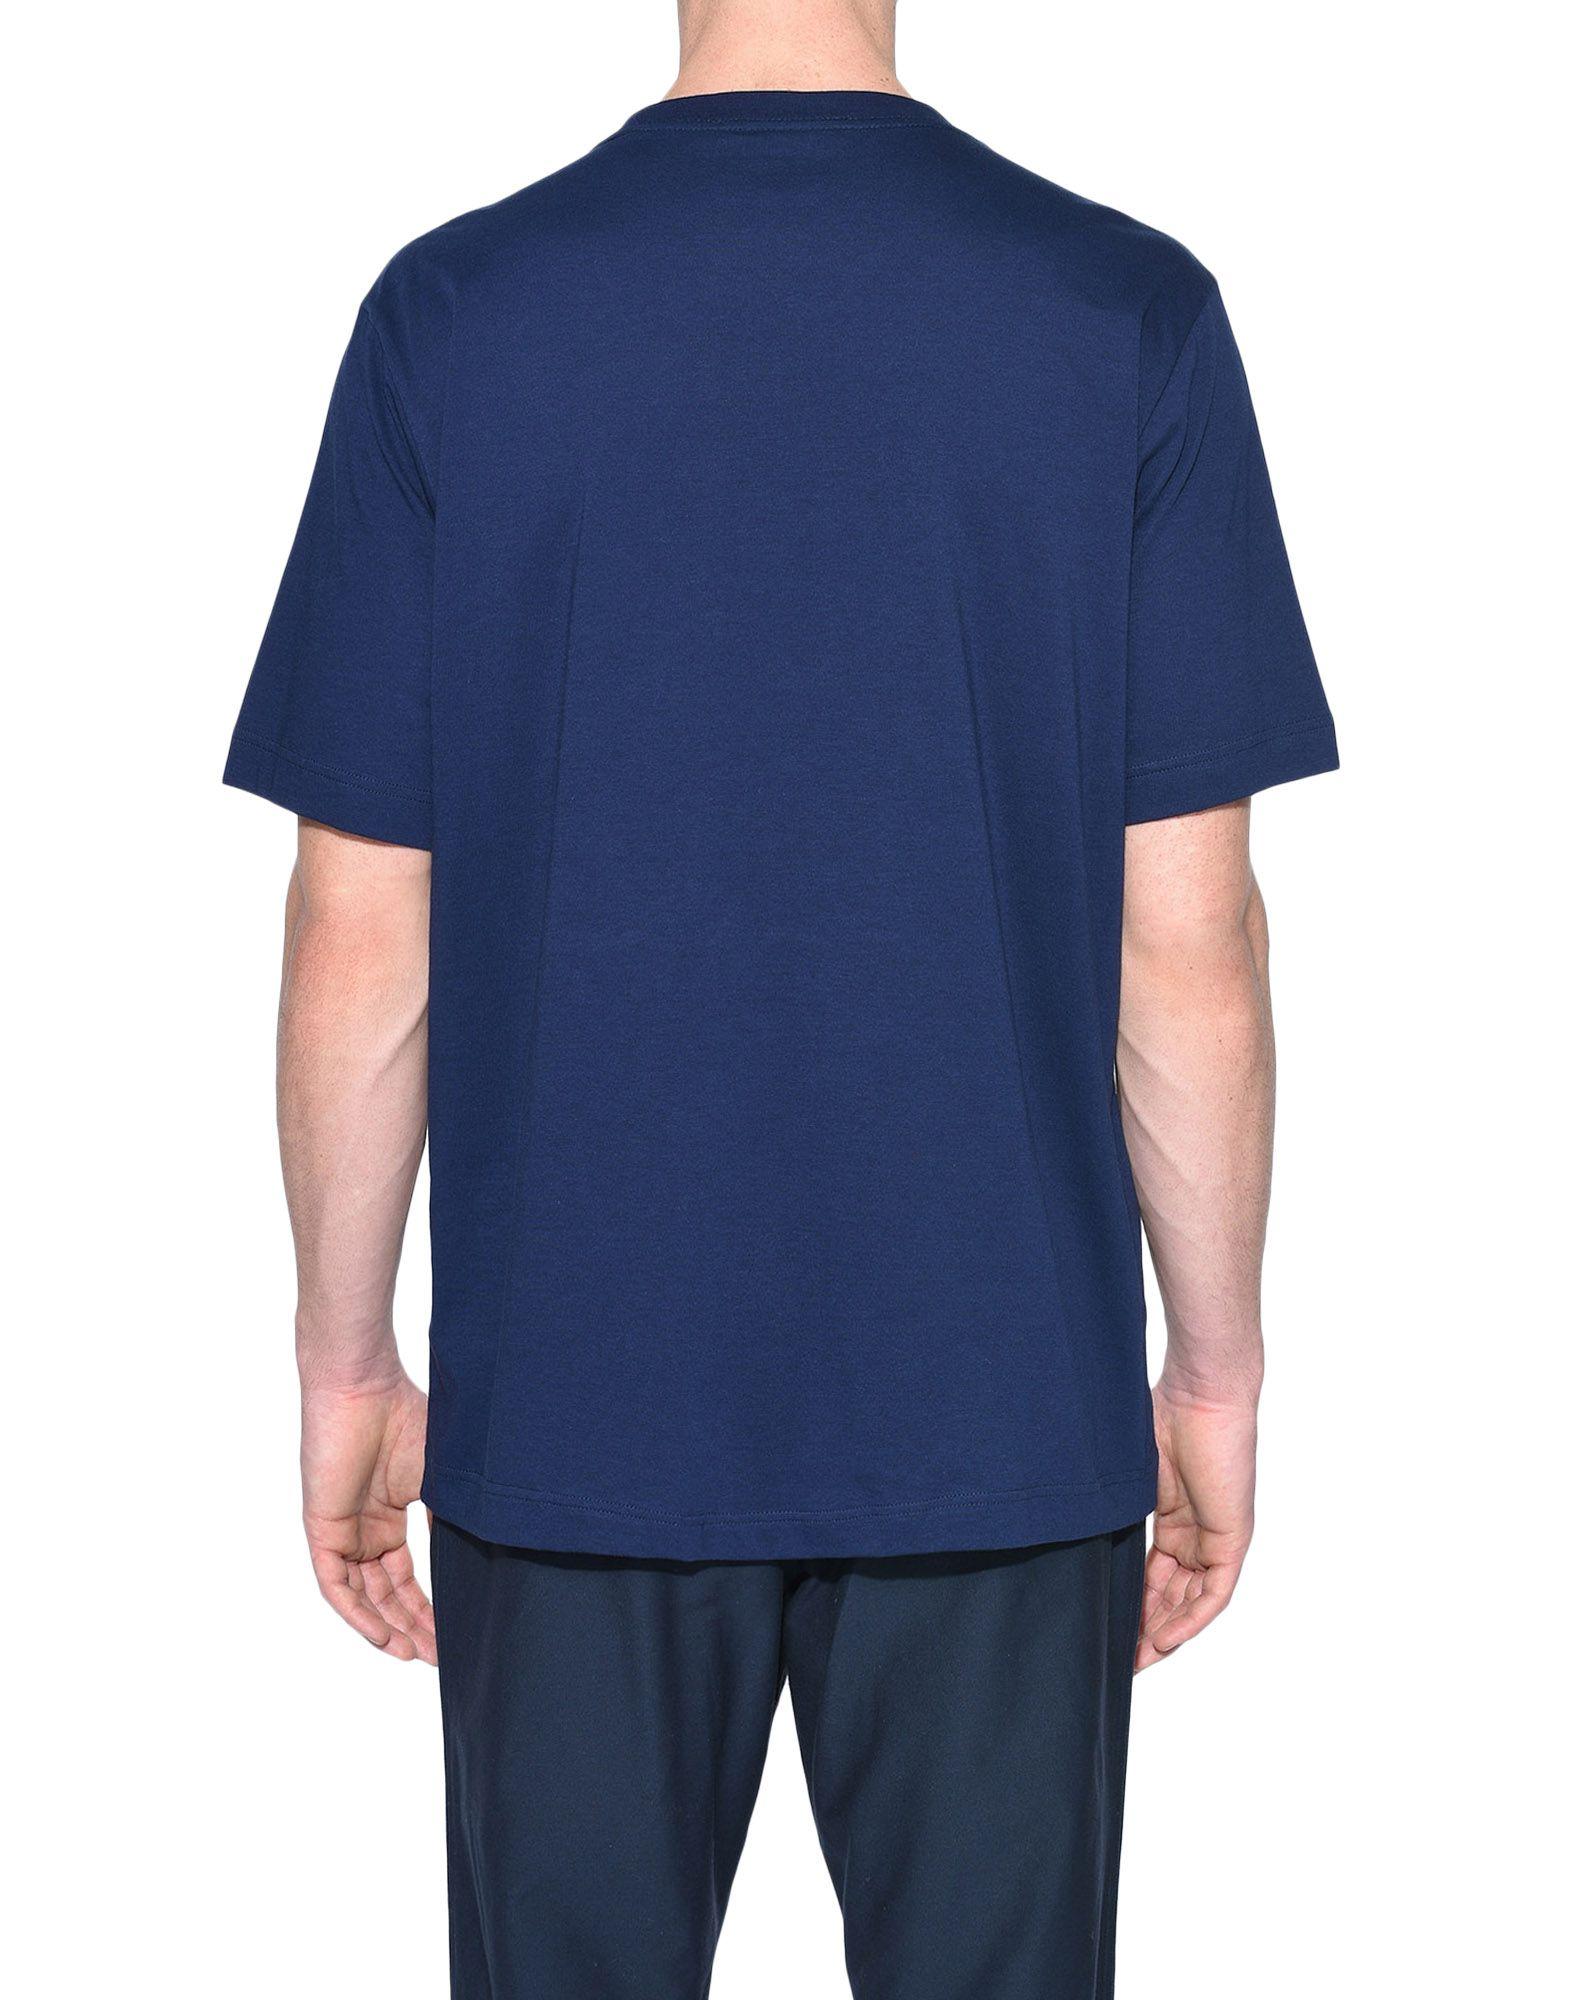 Y-3 Y-3 Stacked Logo Tee Short sleeve t-shirt Man d